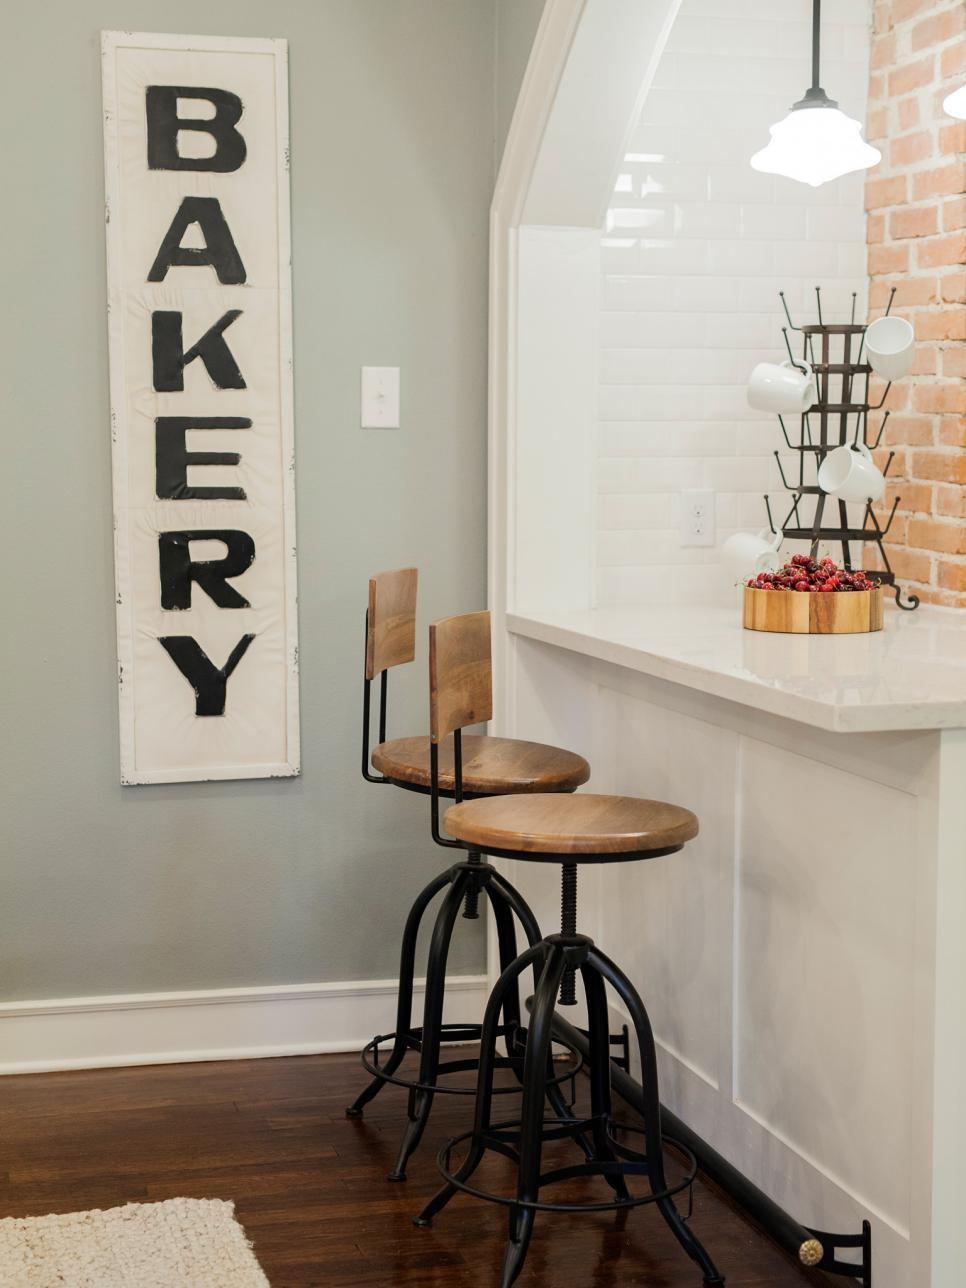 Fixer upper kitchen signs - Baylor11